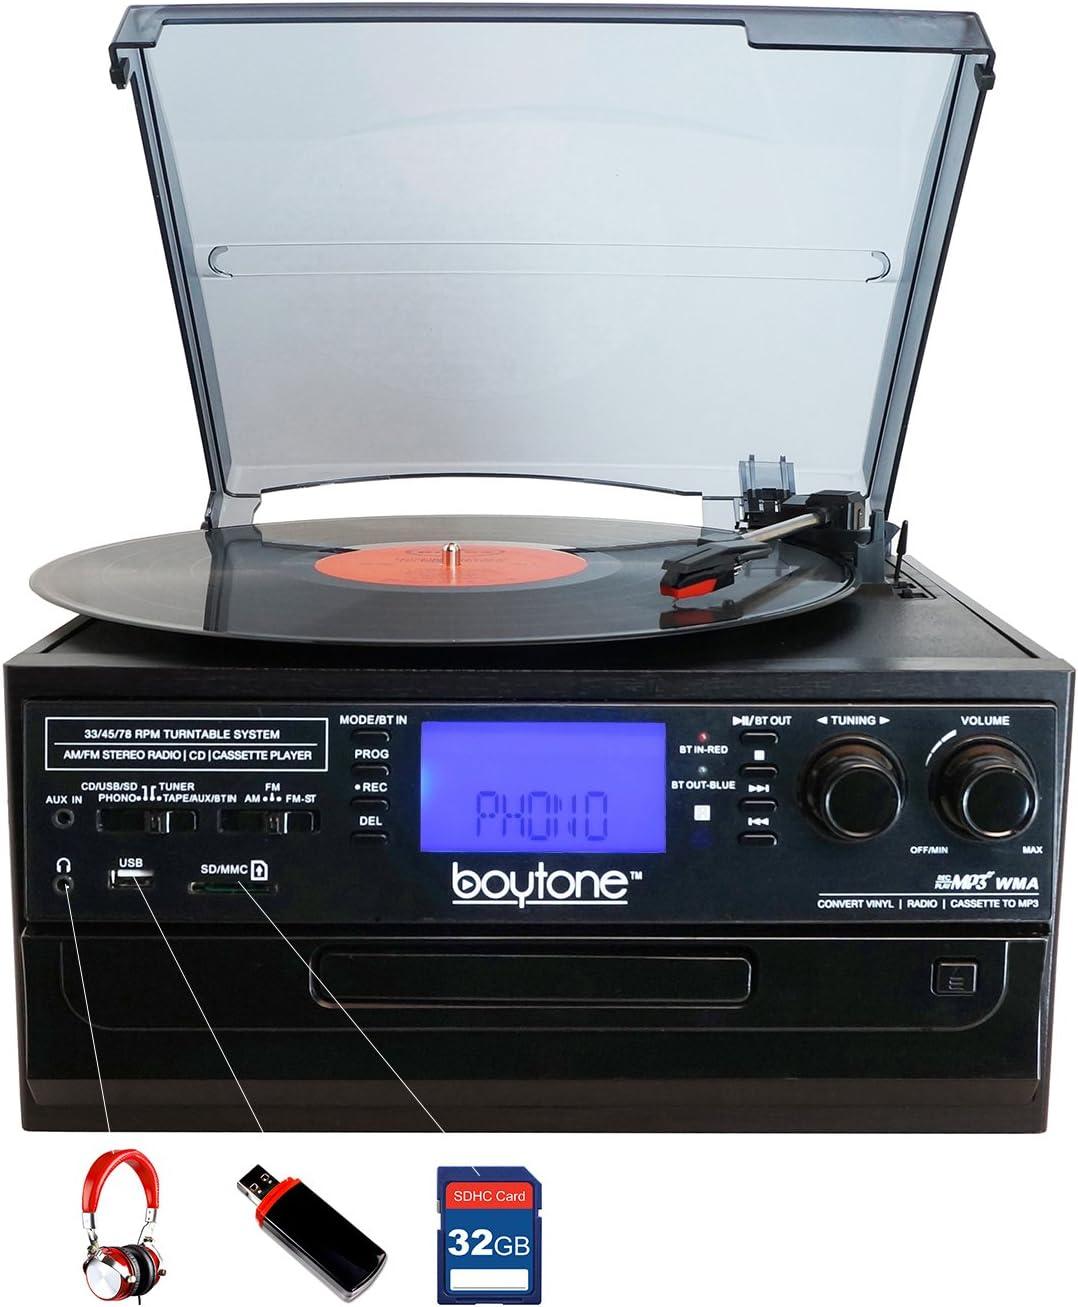 Amazon.com: boytone bt-22b, Bluetooth Record Player ...